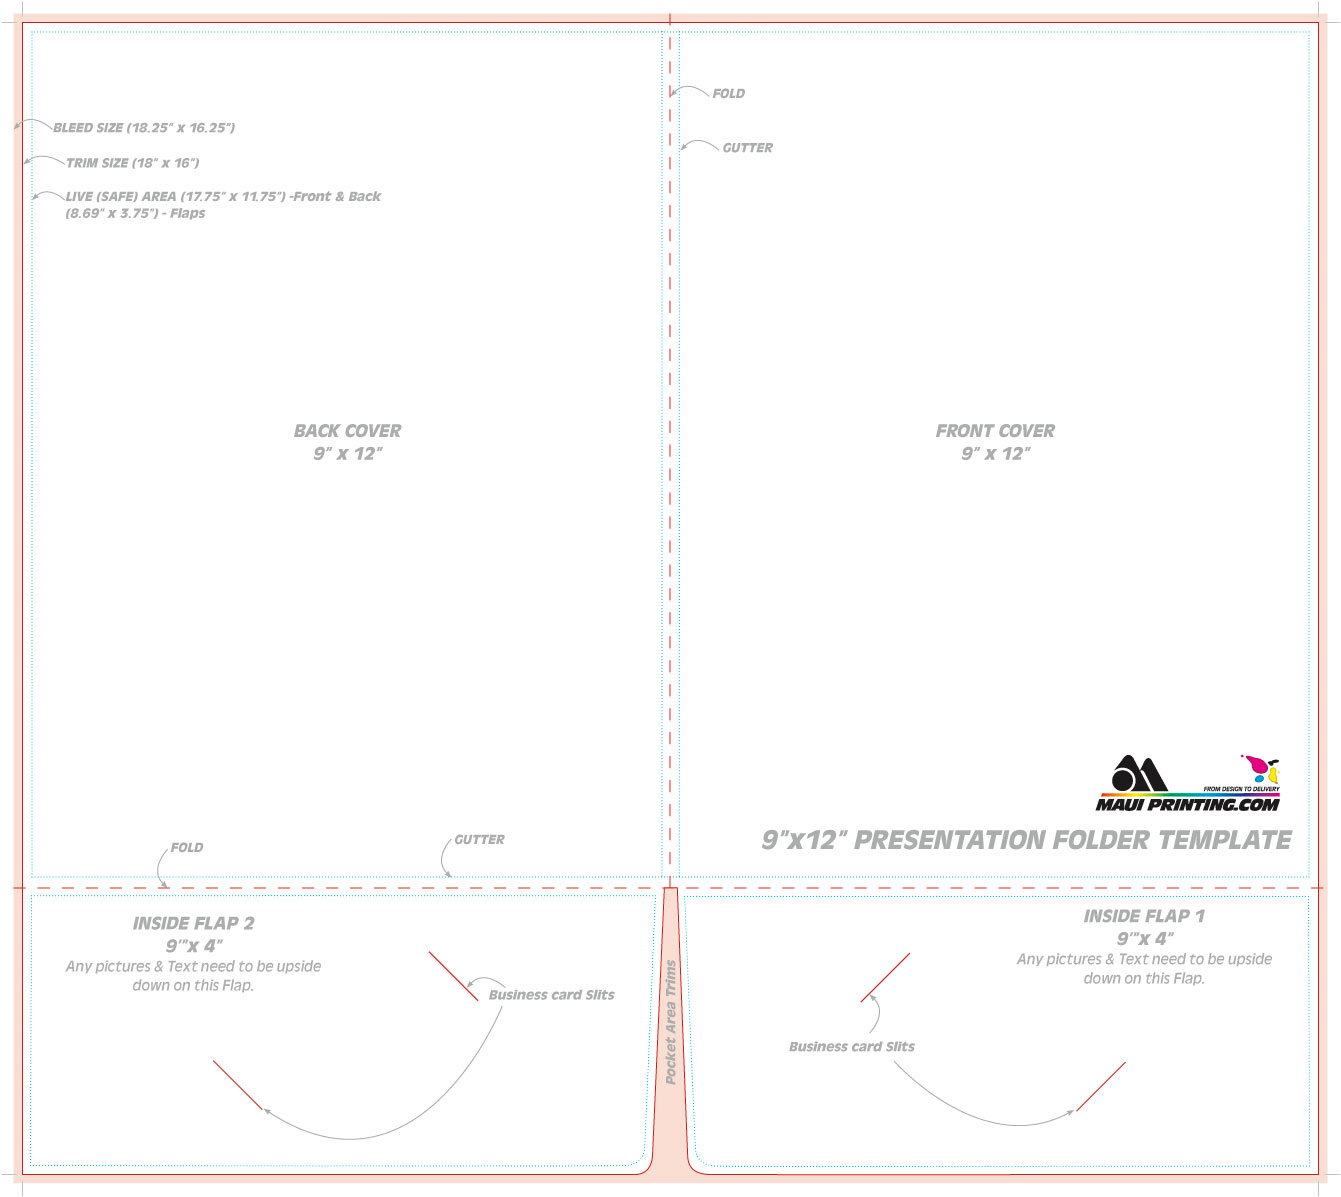 Maui printing company inc 9 x 12 presentation folder template 9 x 12 presentation folder template flashek Gallery